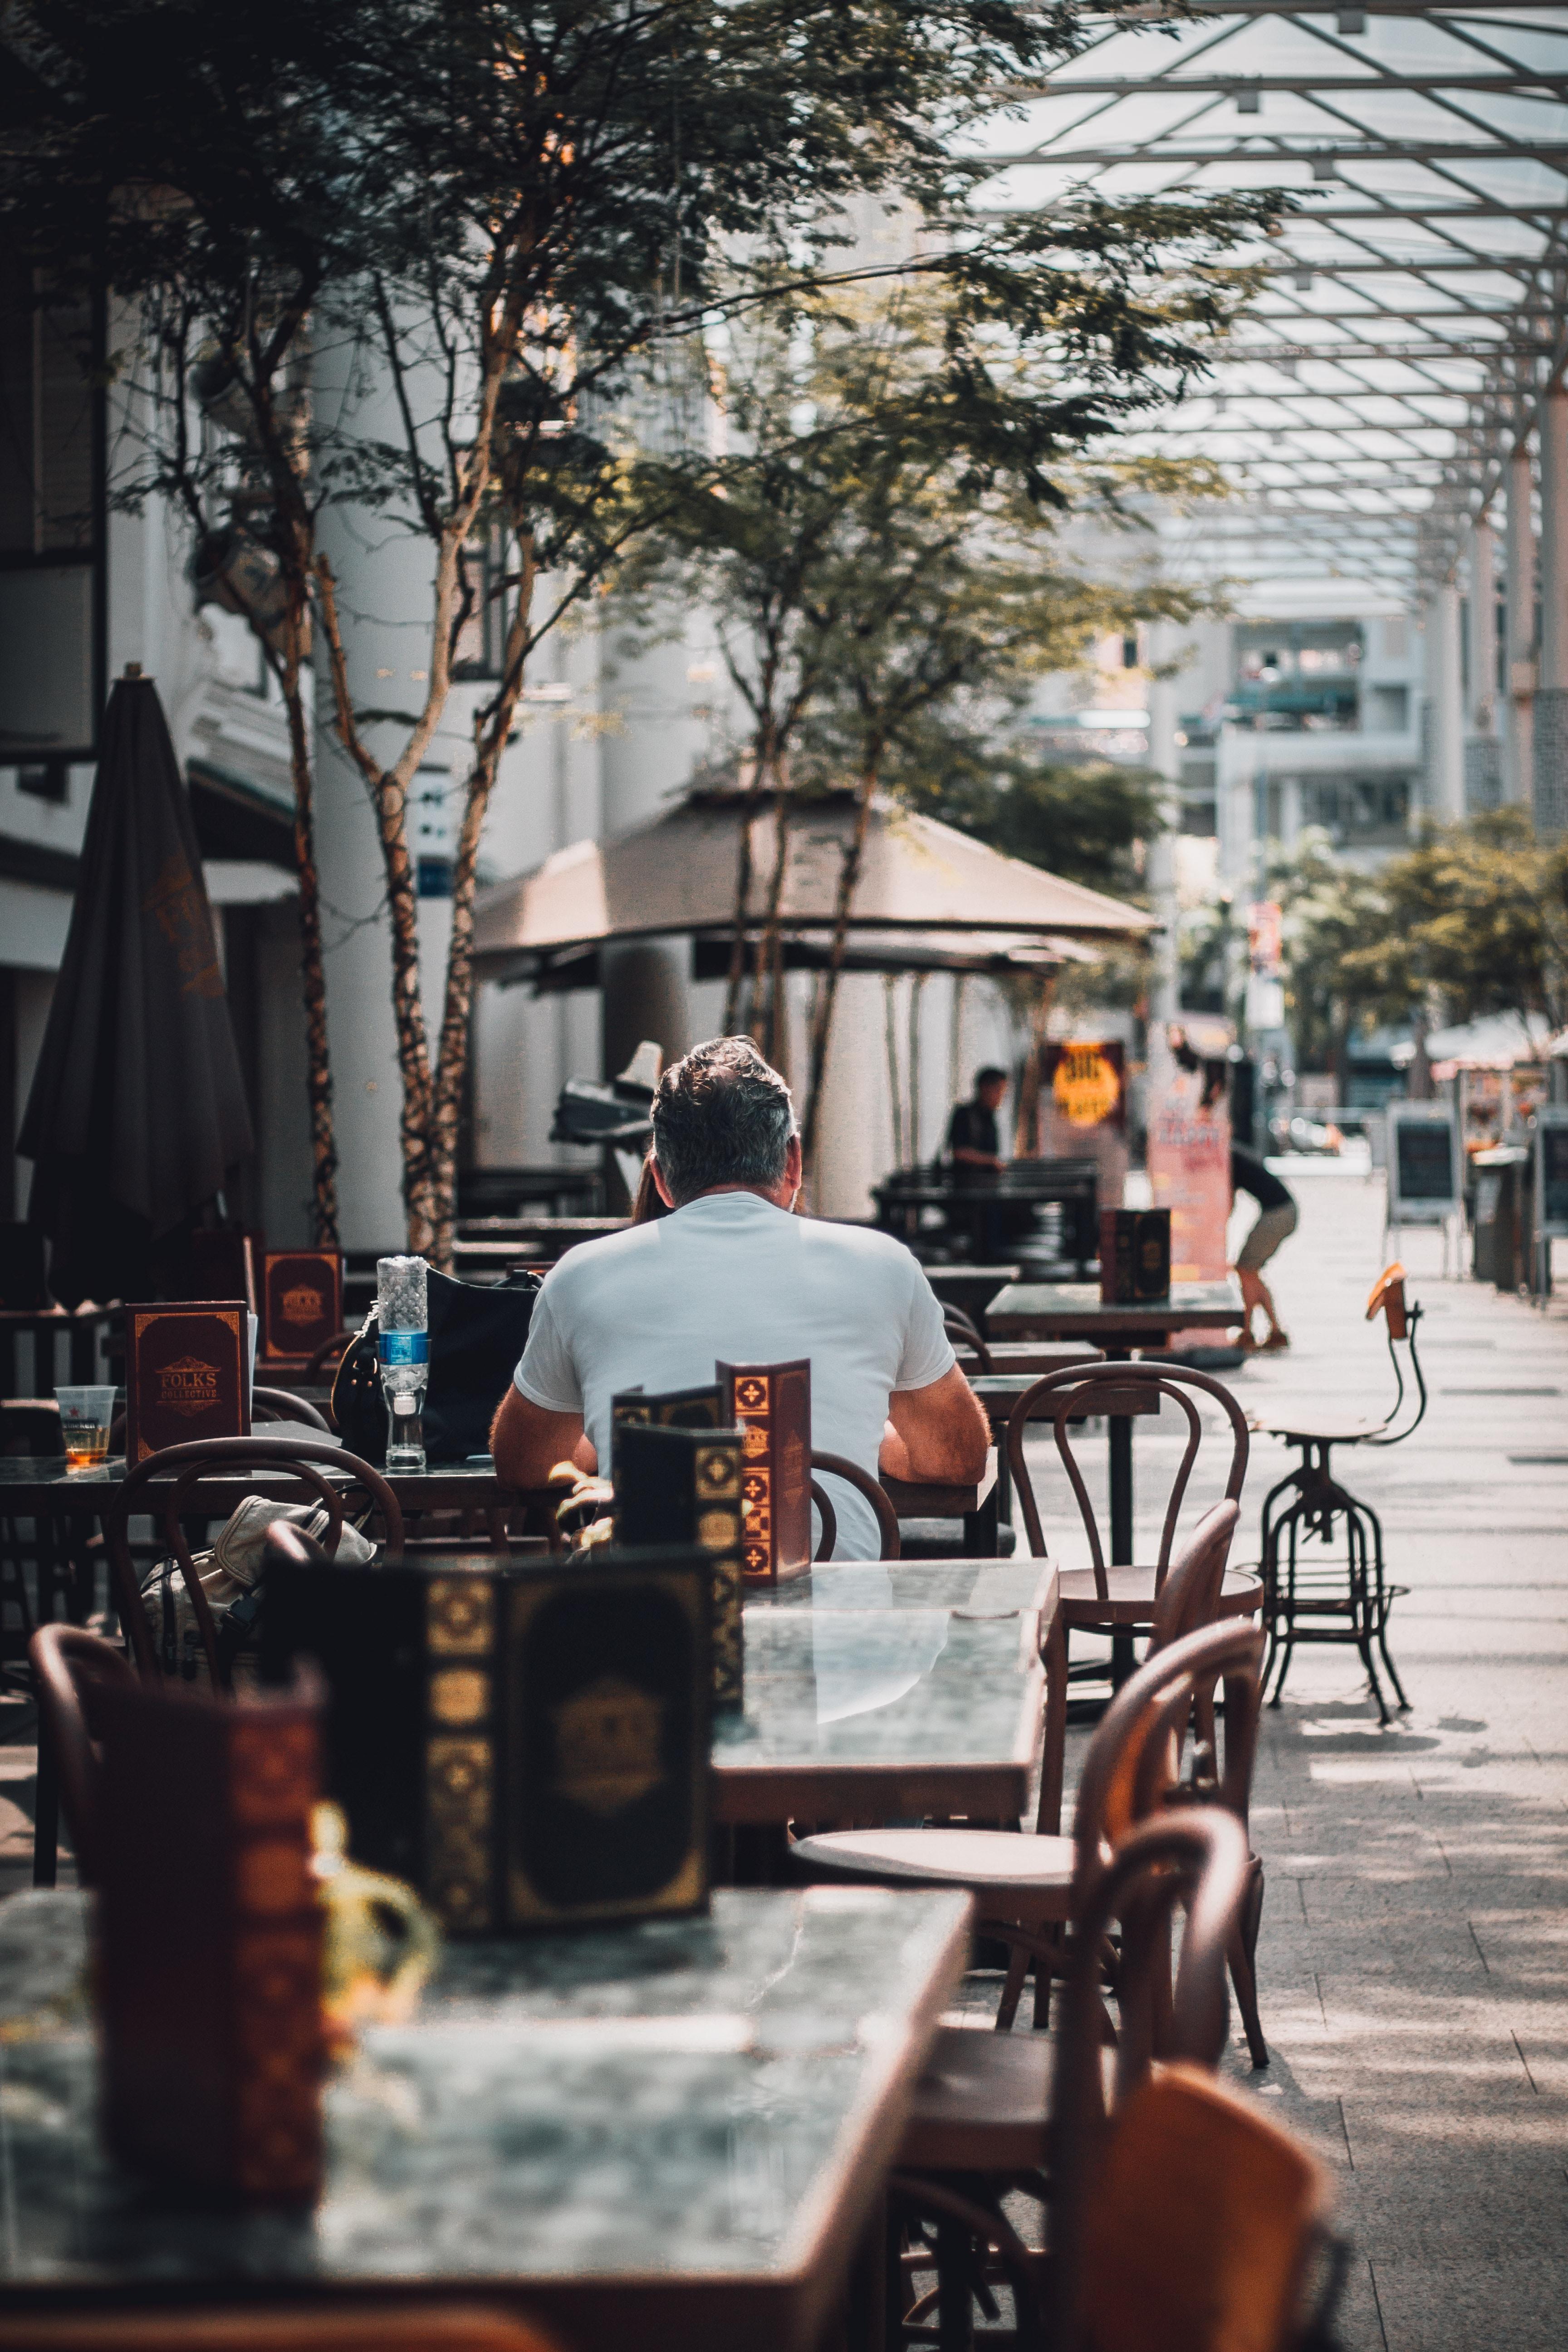 man sitting on chair near tree